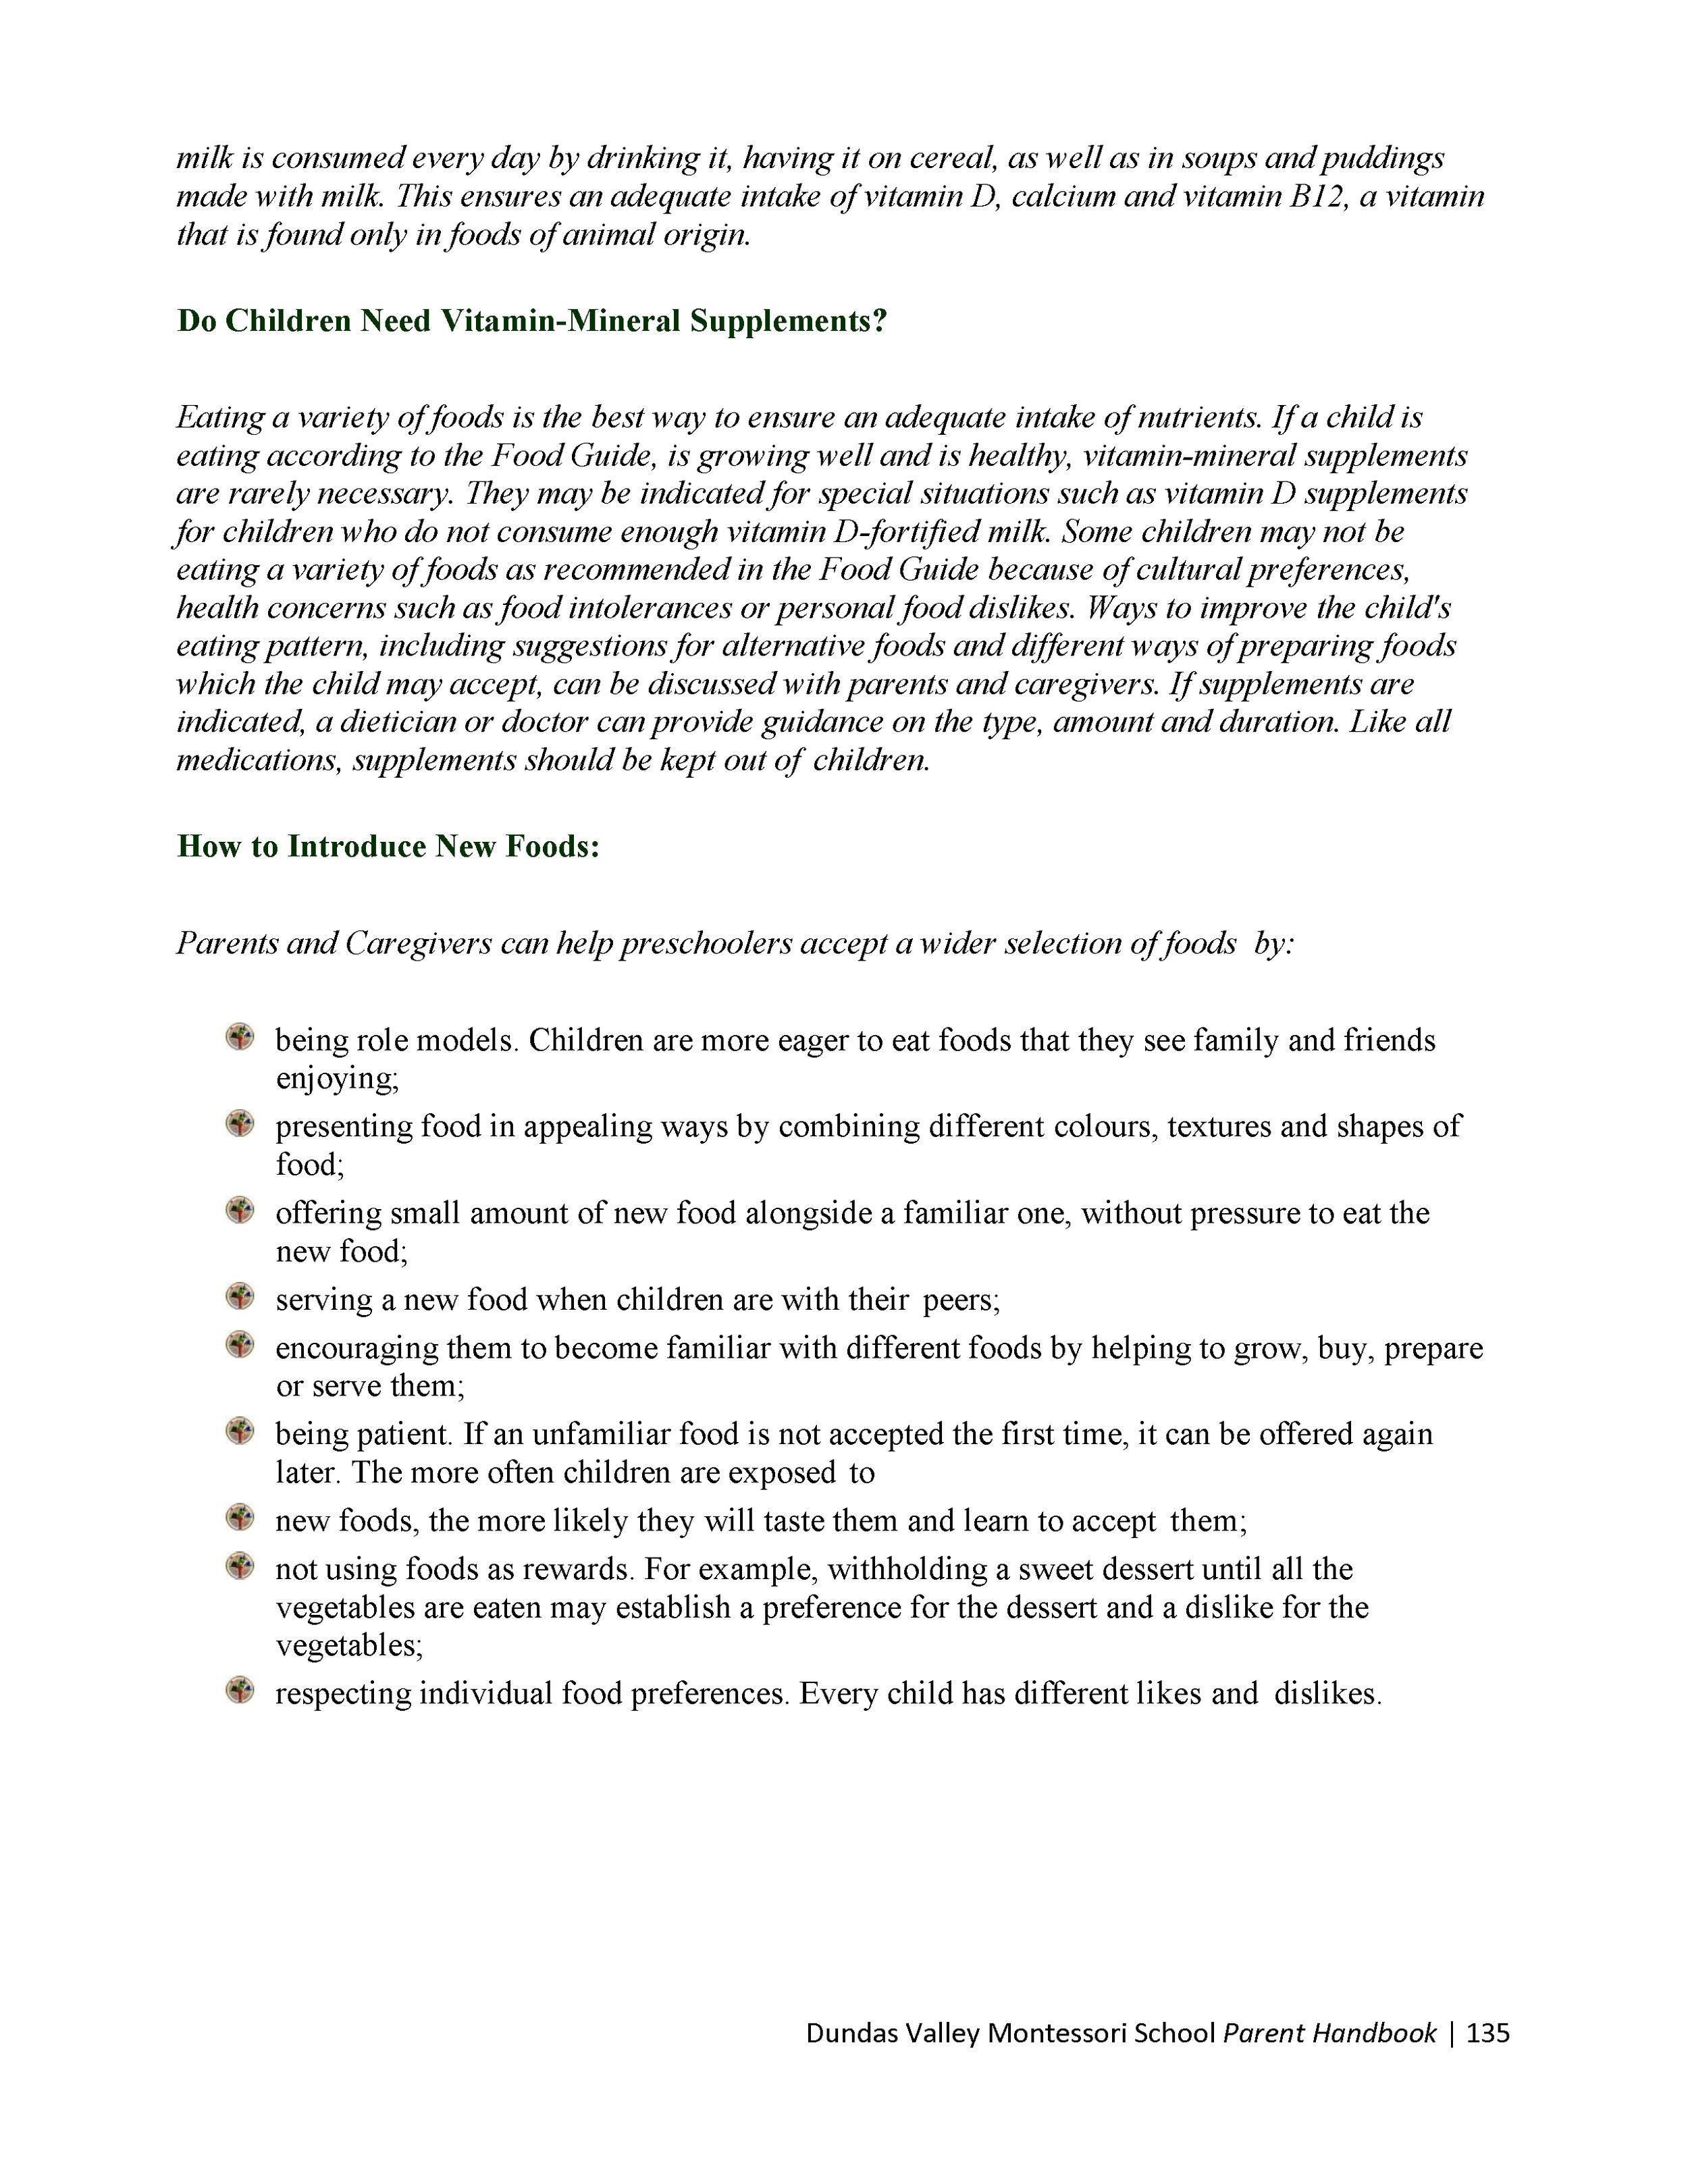 DVMS-Parent-Handbook-19-20_Page_137.png